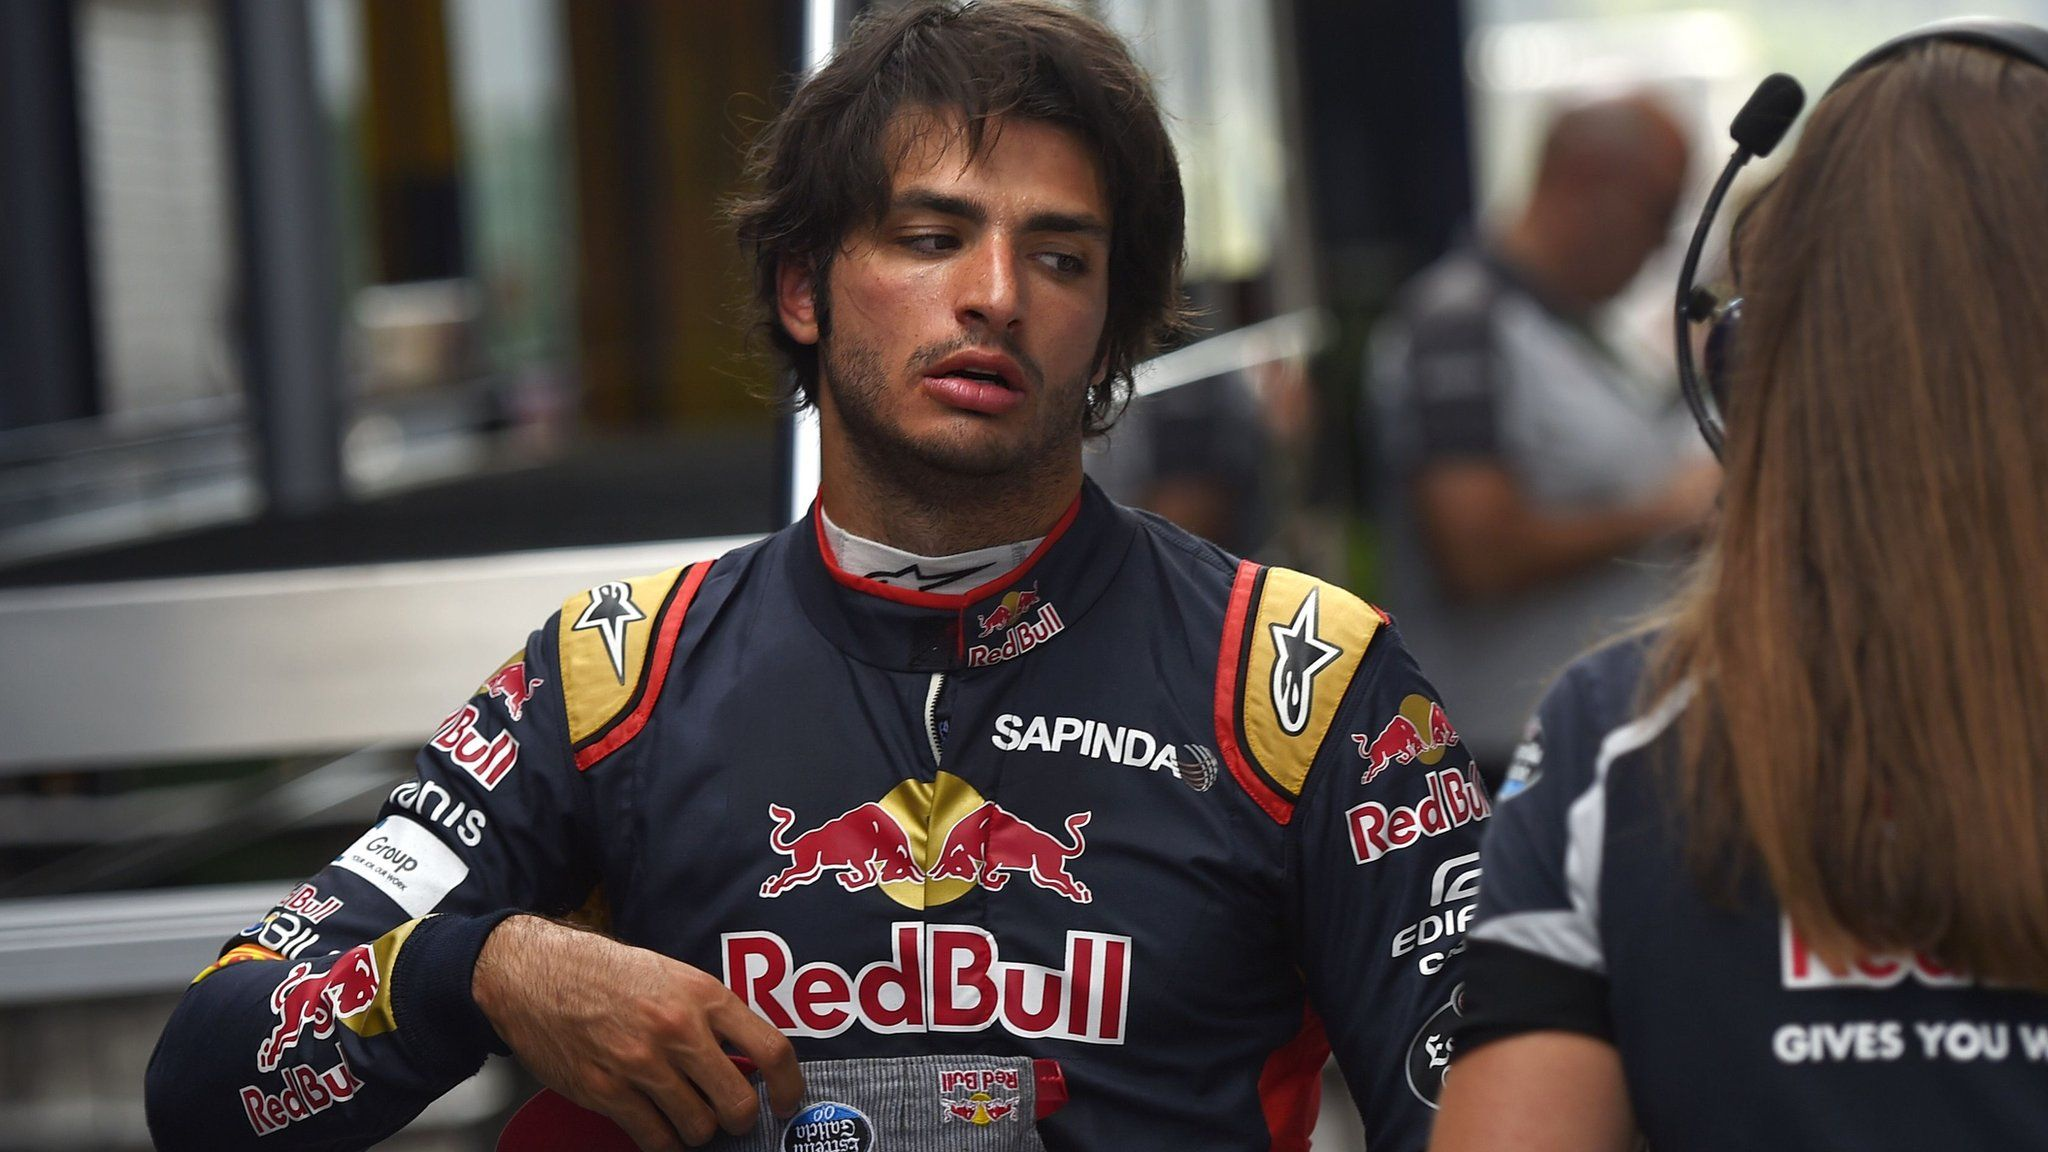 F1 gossip F1's 8.5bn sale, Zika concerns and Monza deal